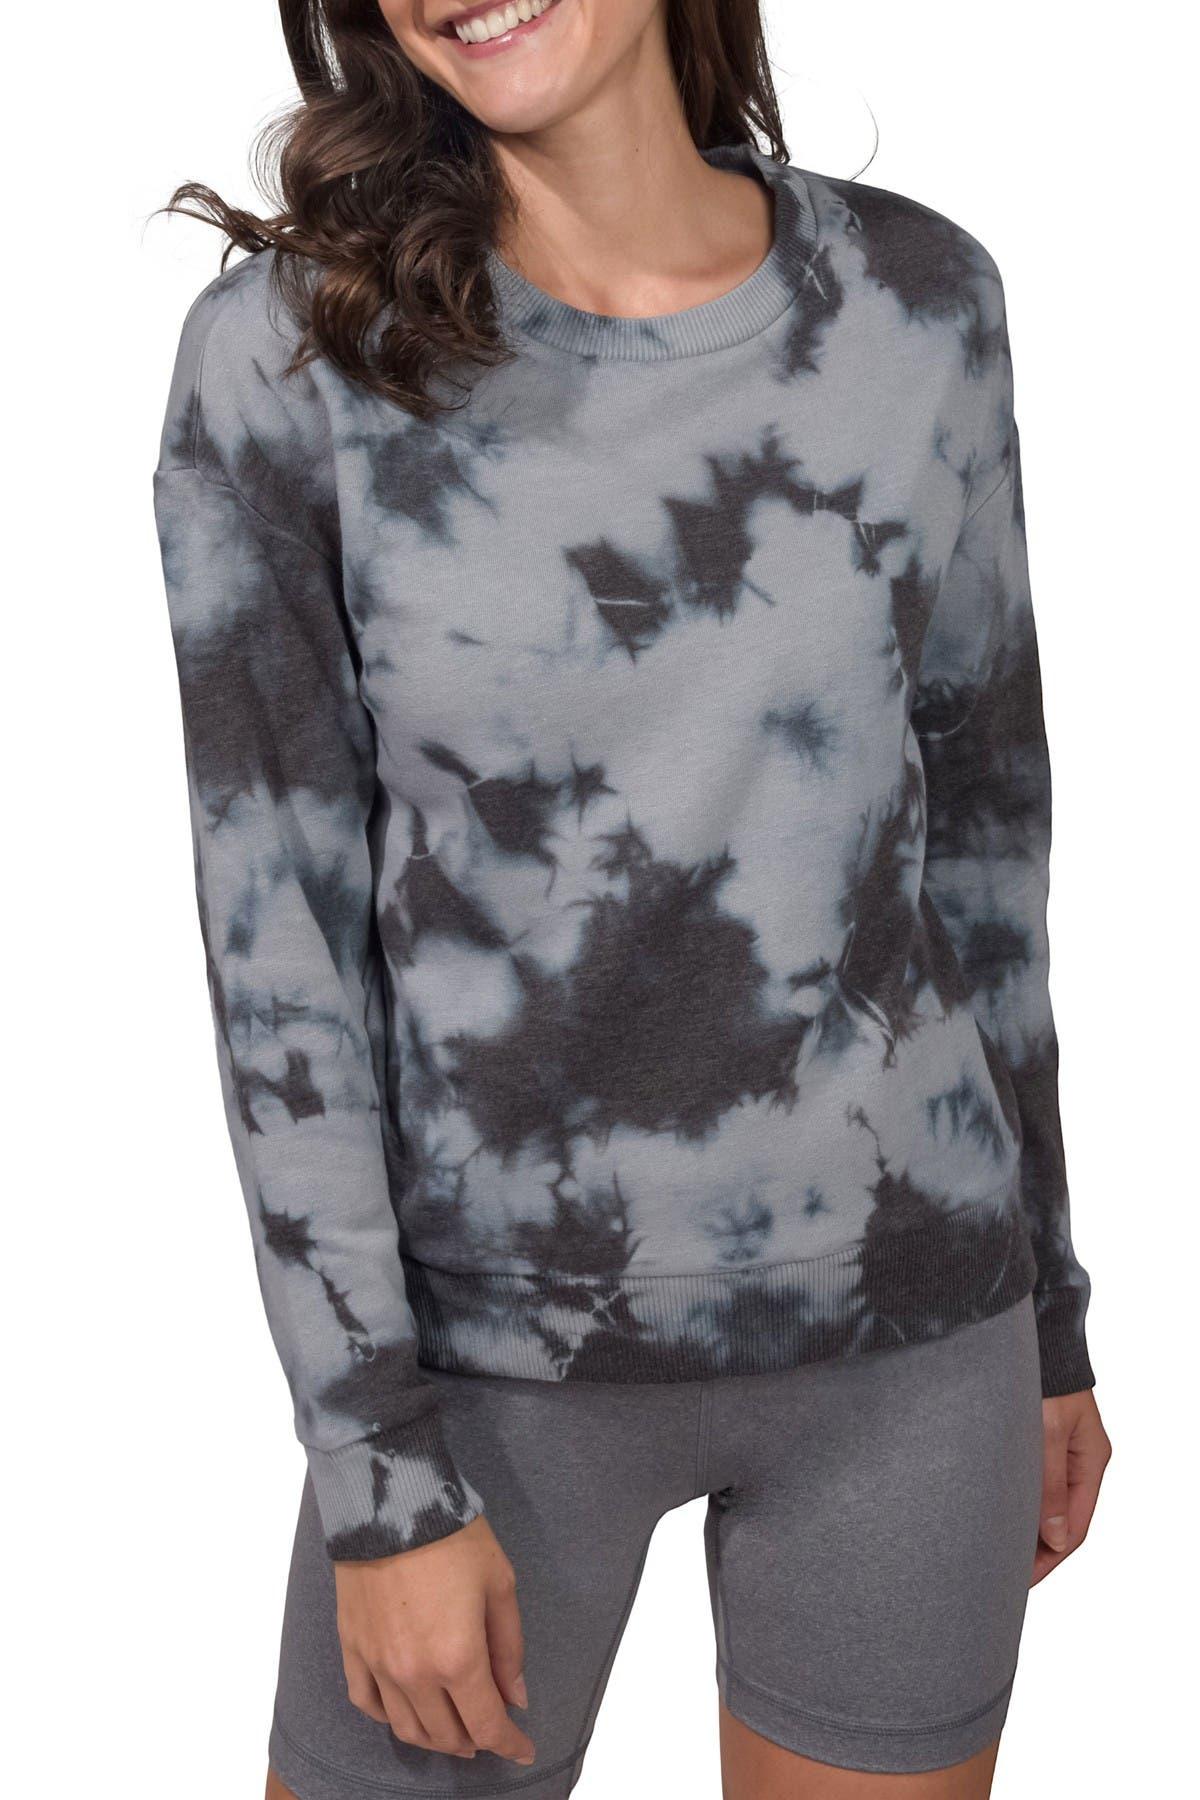 Image of 90 Degree By Reflex Brushed Tie Dye Sweatshirt